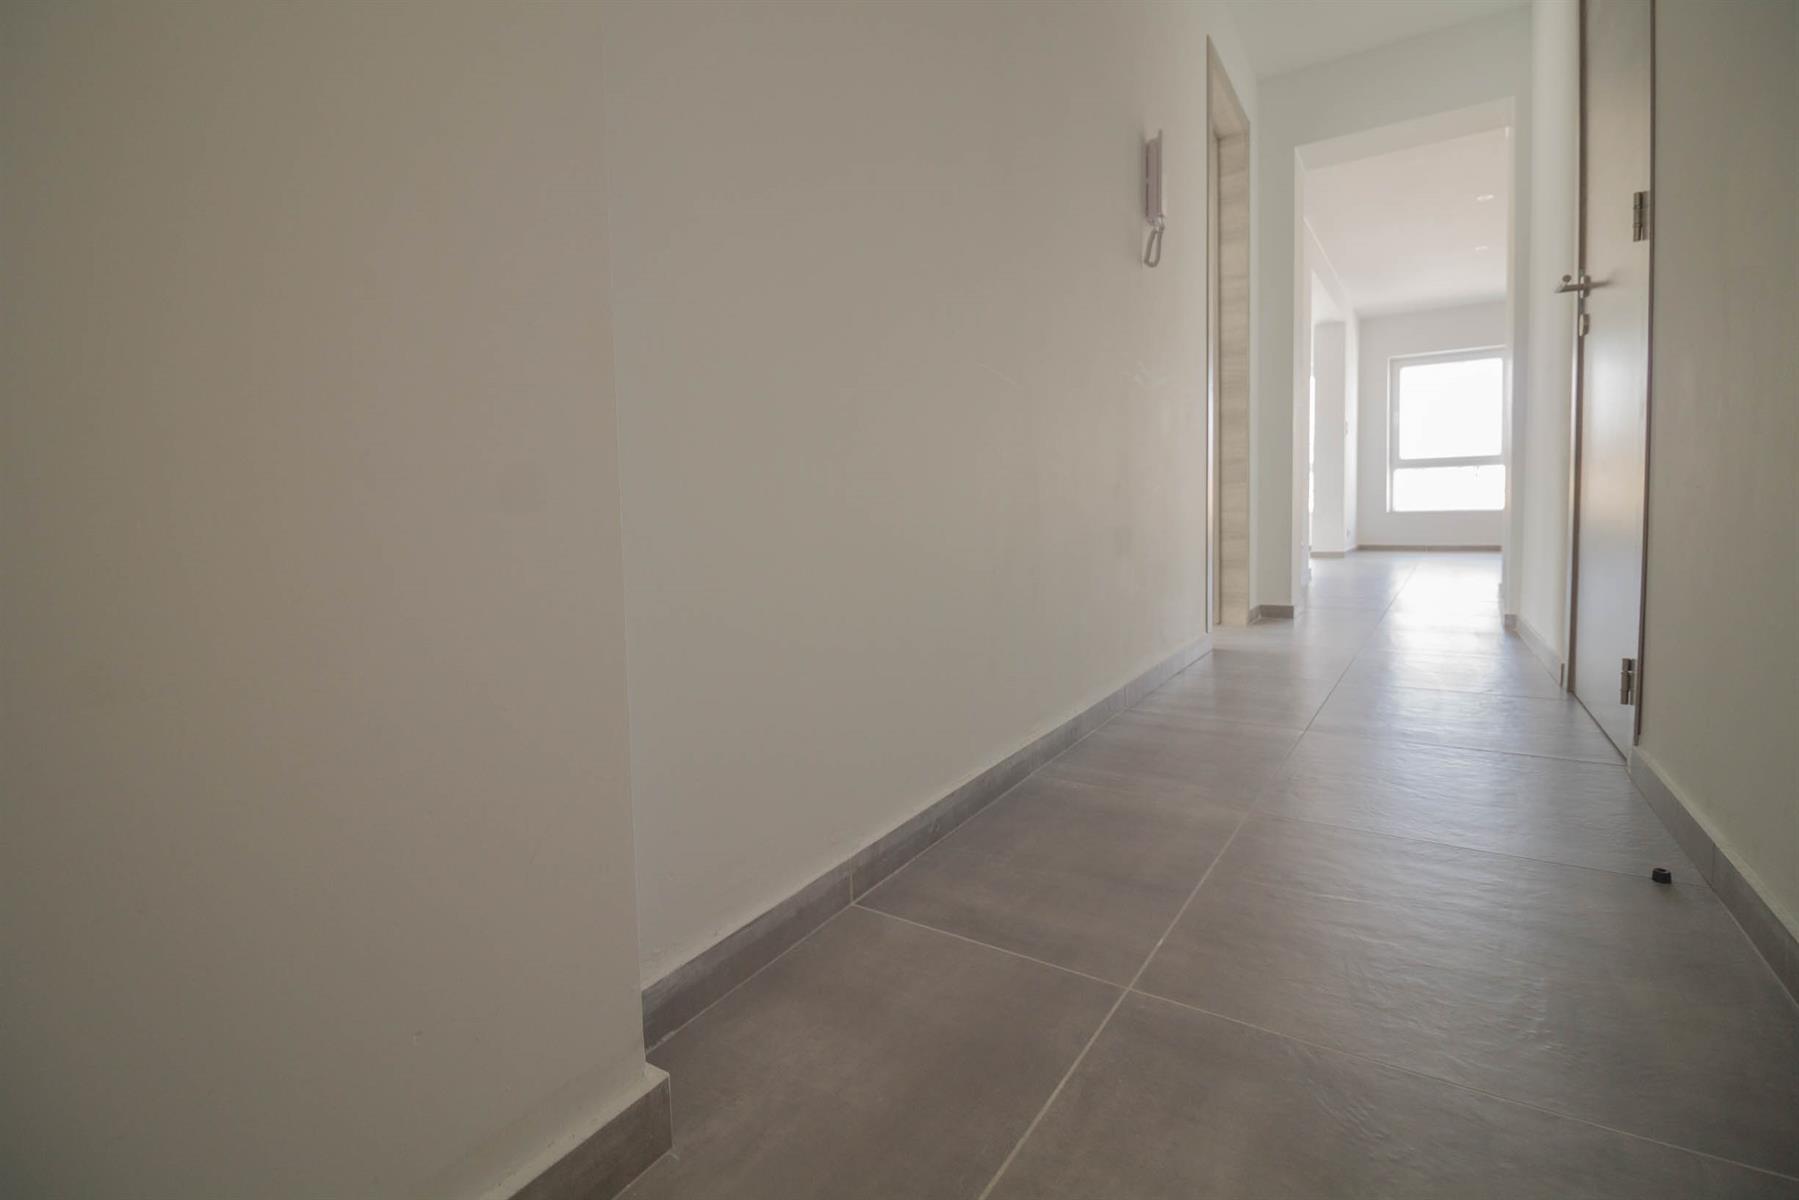 Appartement - Peissant - #4321179-10